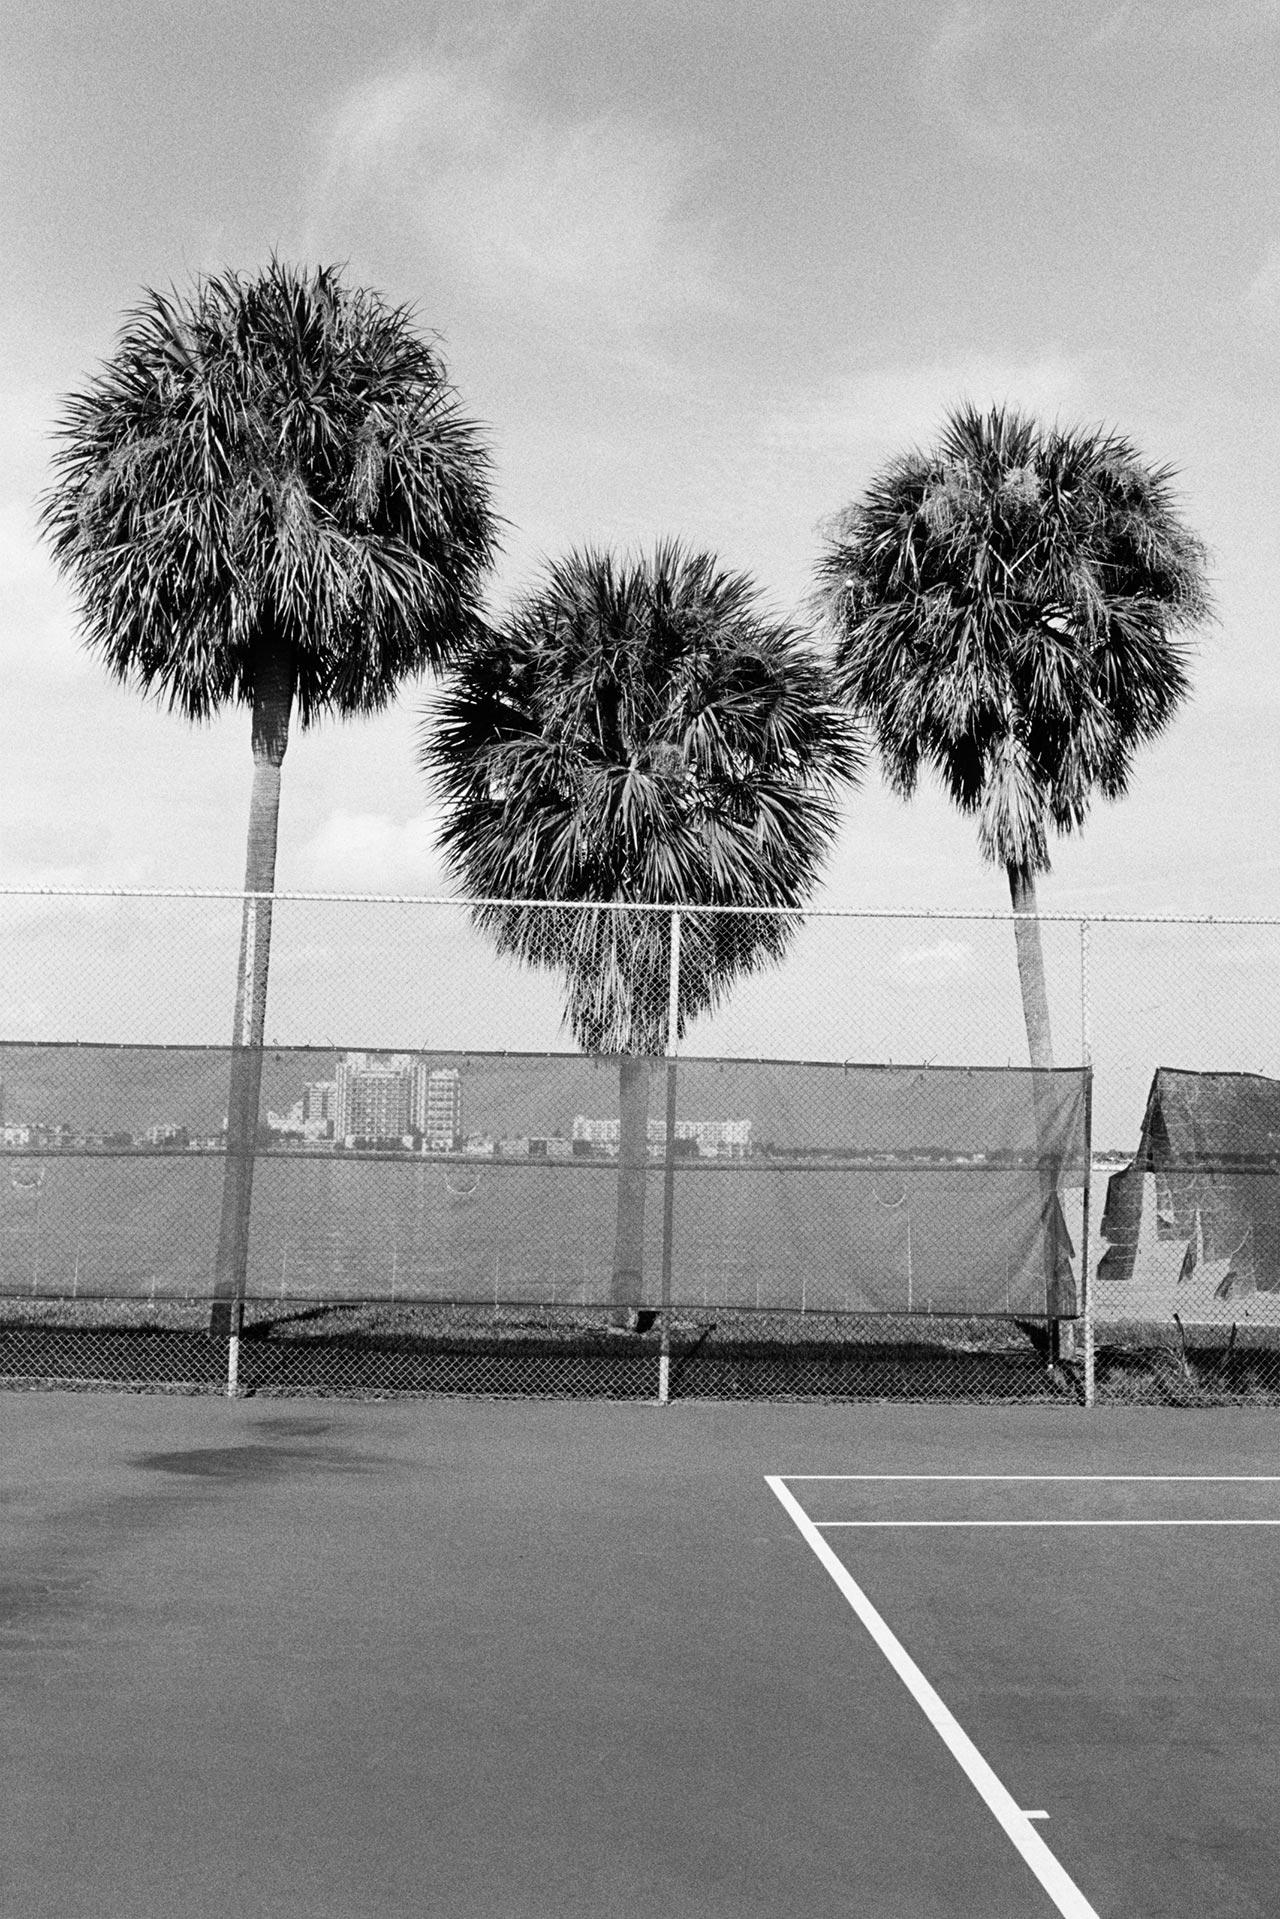 Normandy Shores Tennis Courts Miami Beach, Florida 2015.Photo © Stephan Würth.